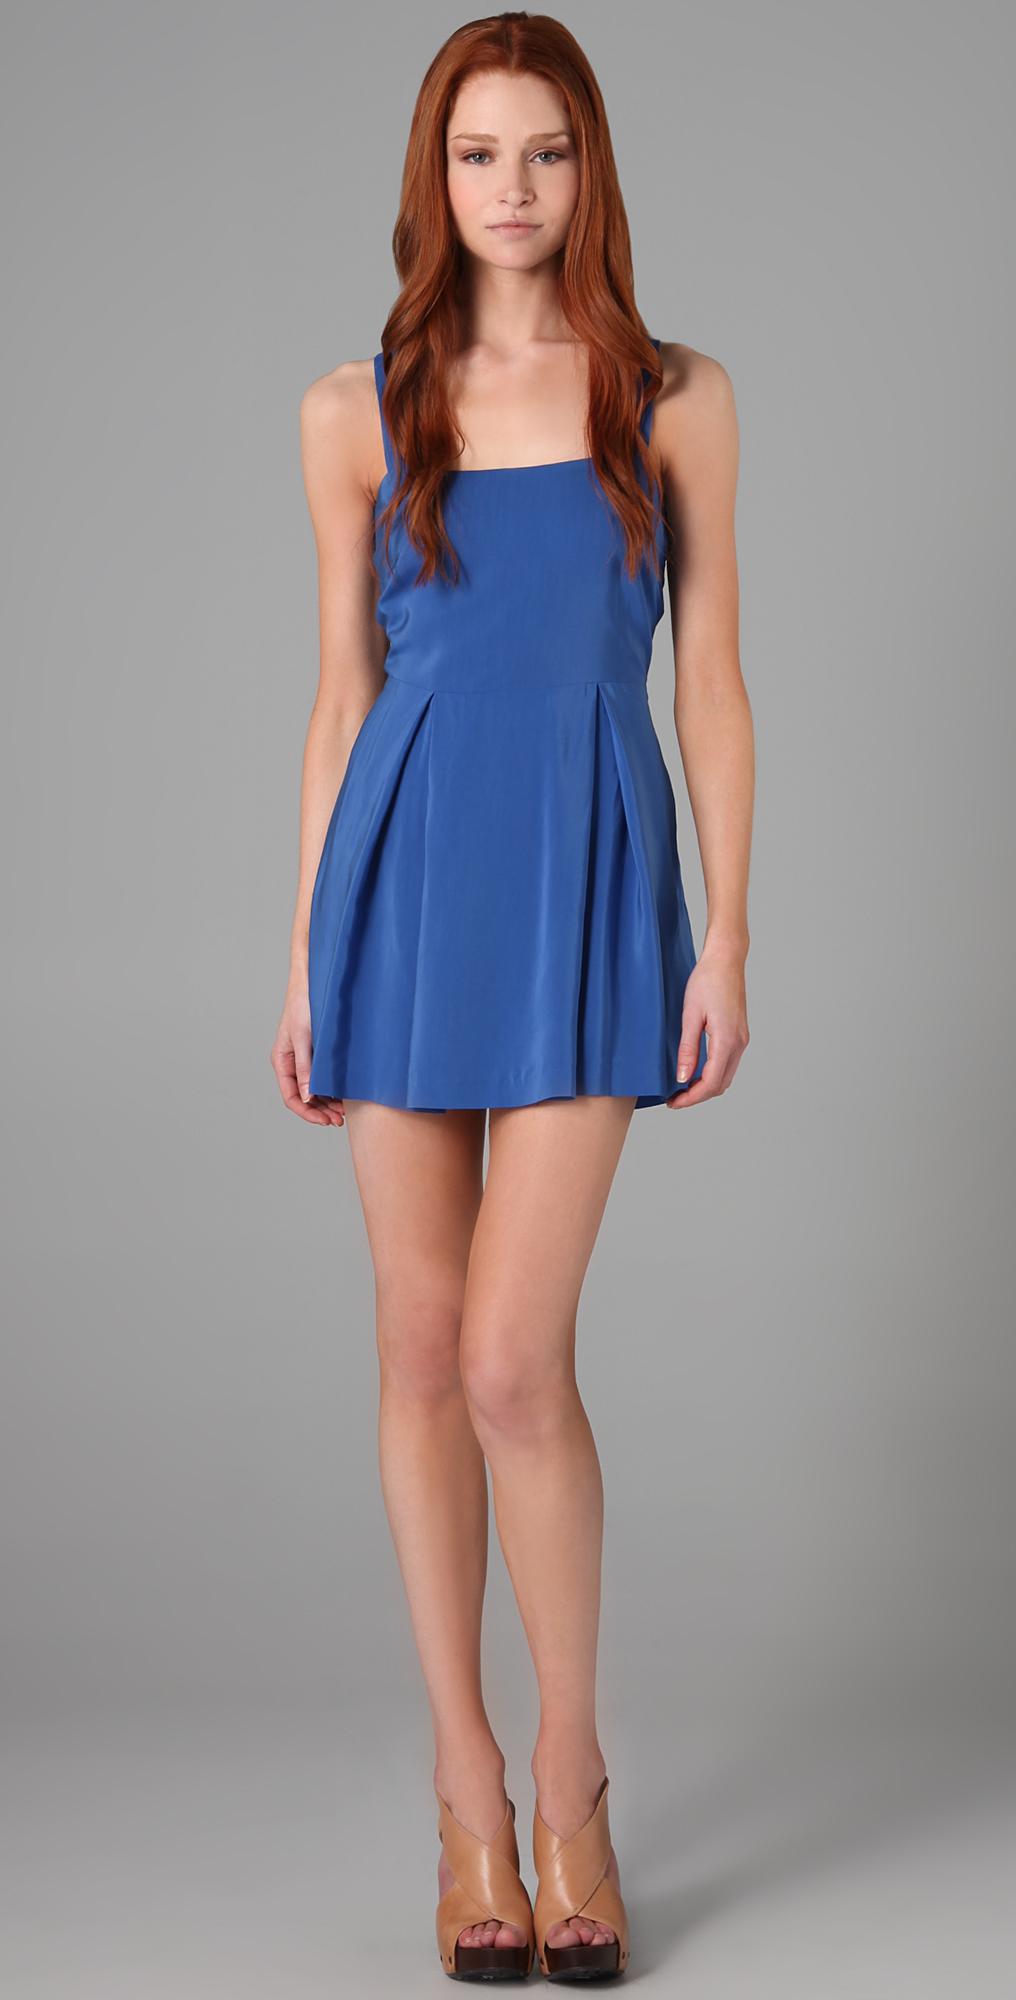 Blue apron dress - Blue Apron Dress 75